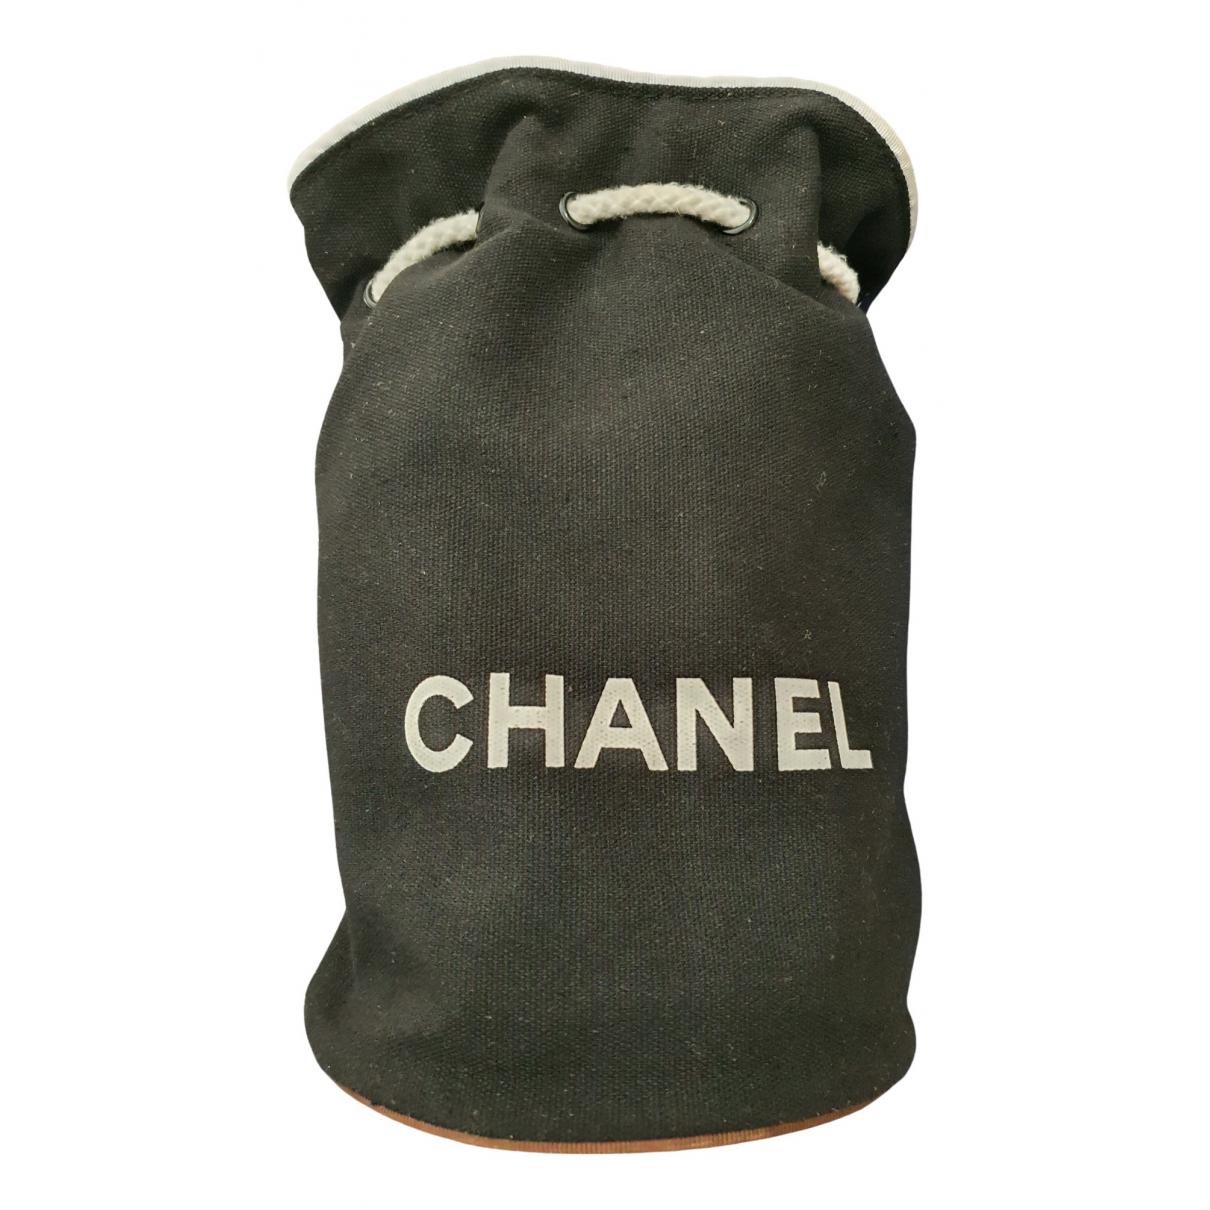 Chanel - Sac a dos   pour femme en coton - noir